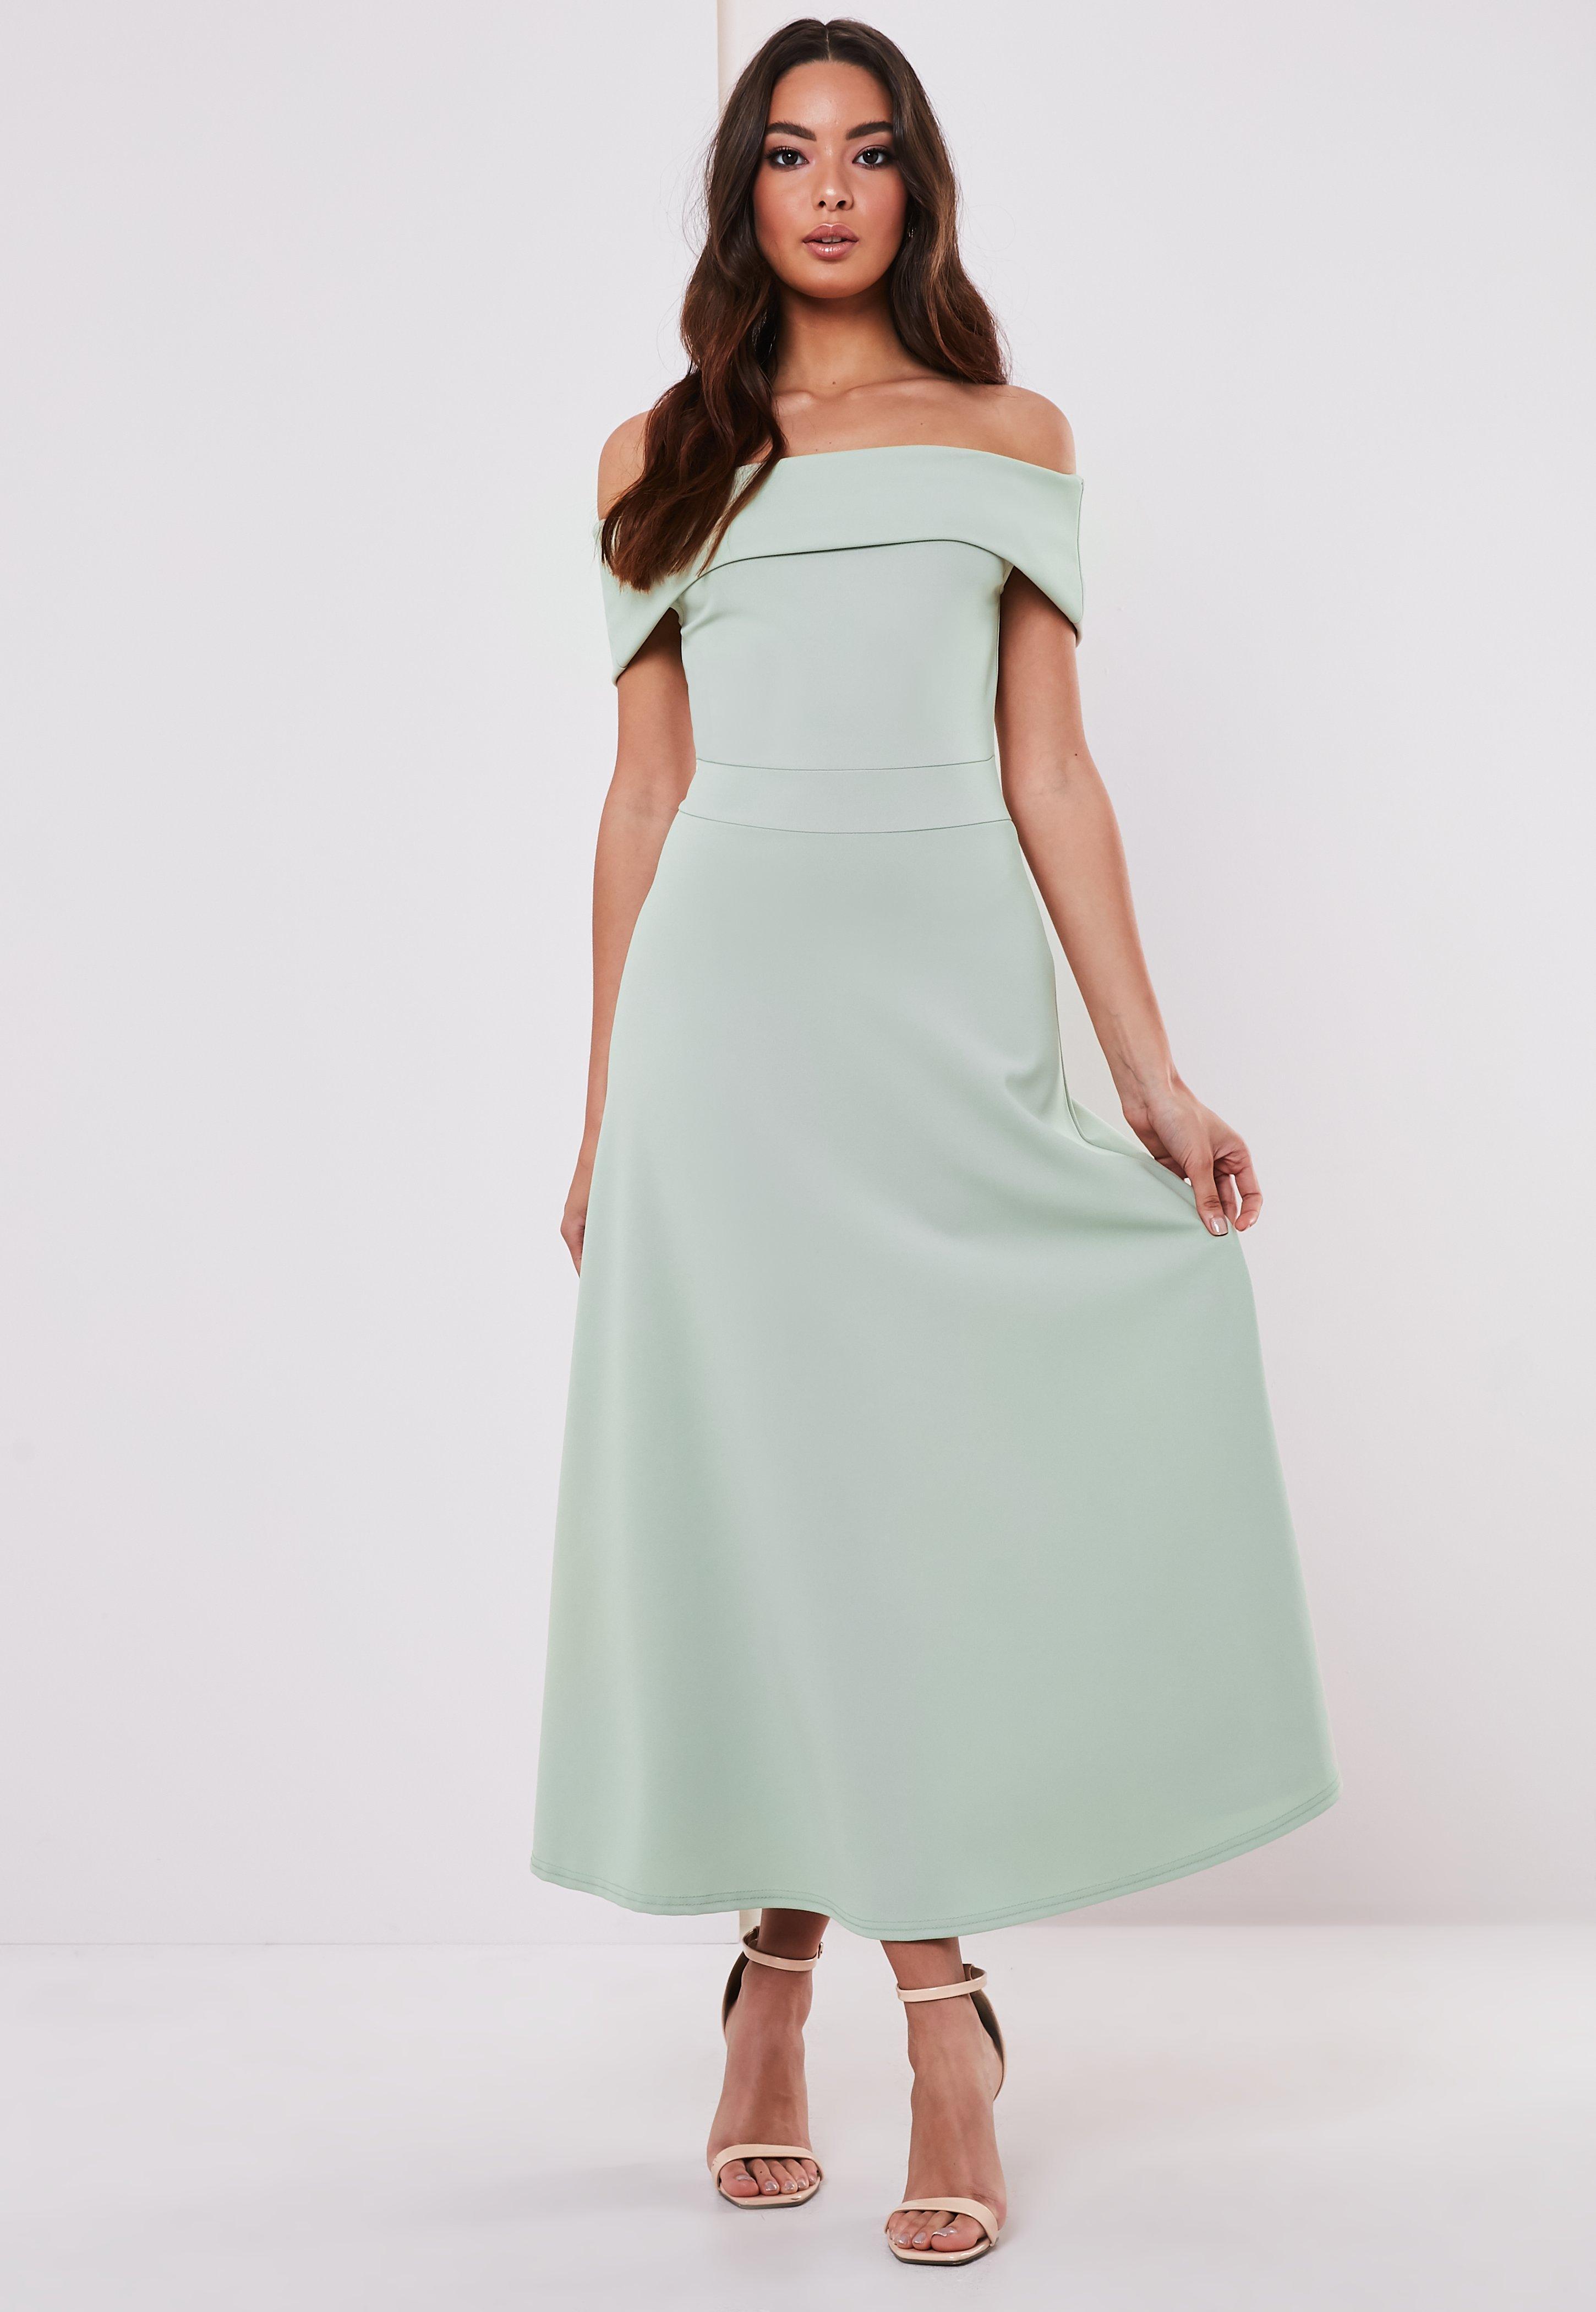 2a49dff497 Sukienki na Studniówkę